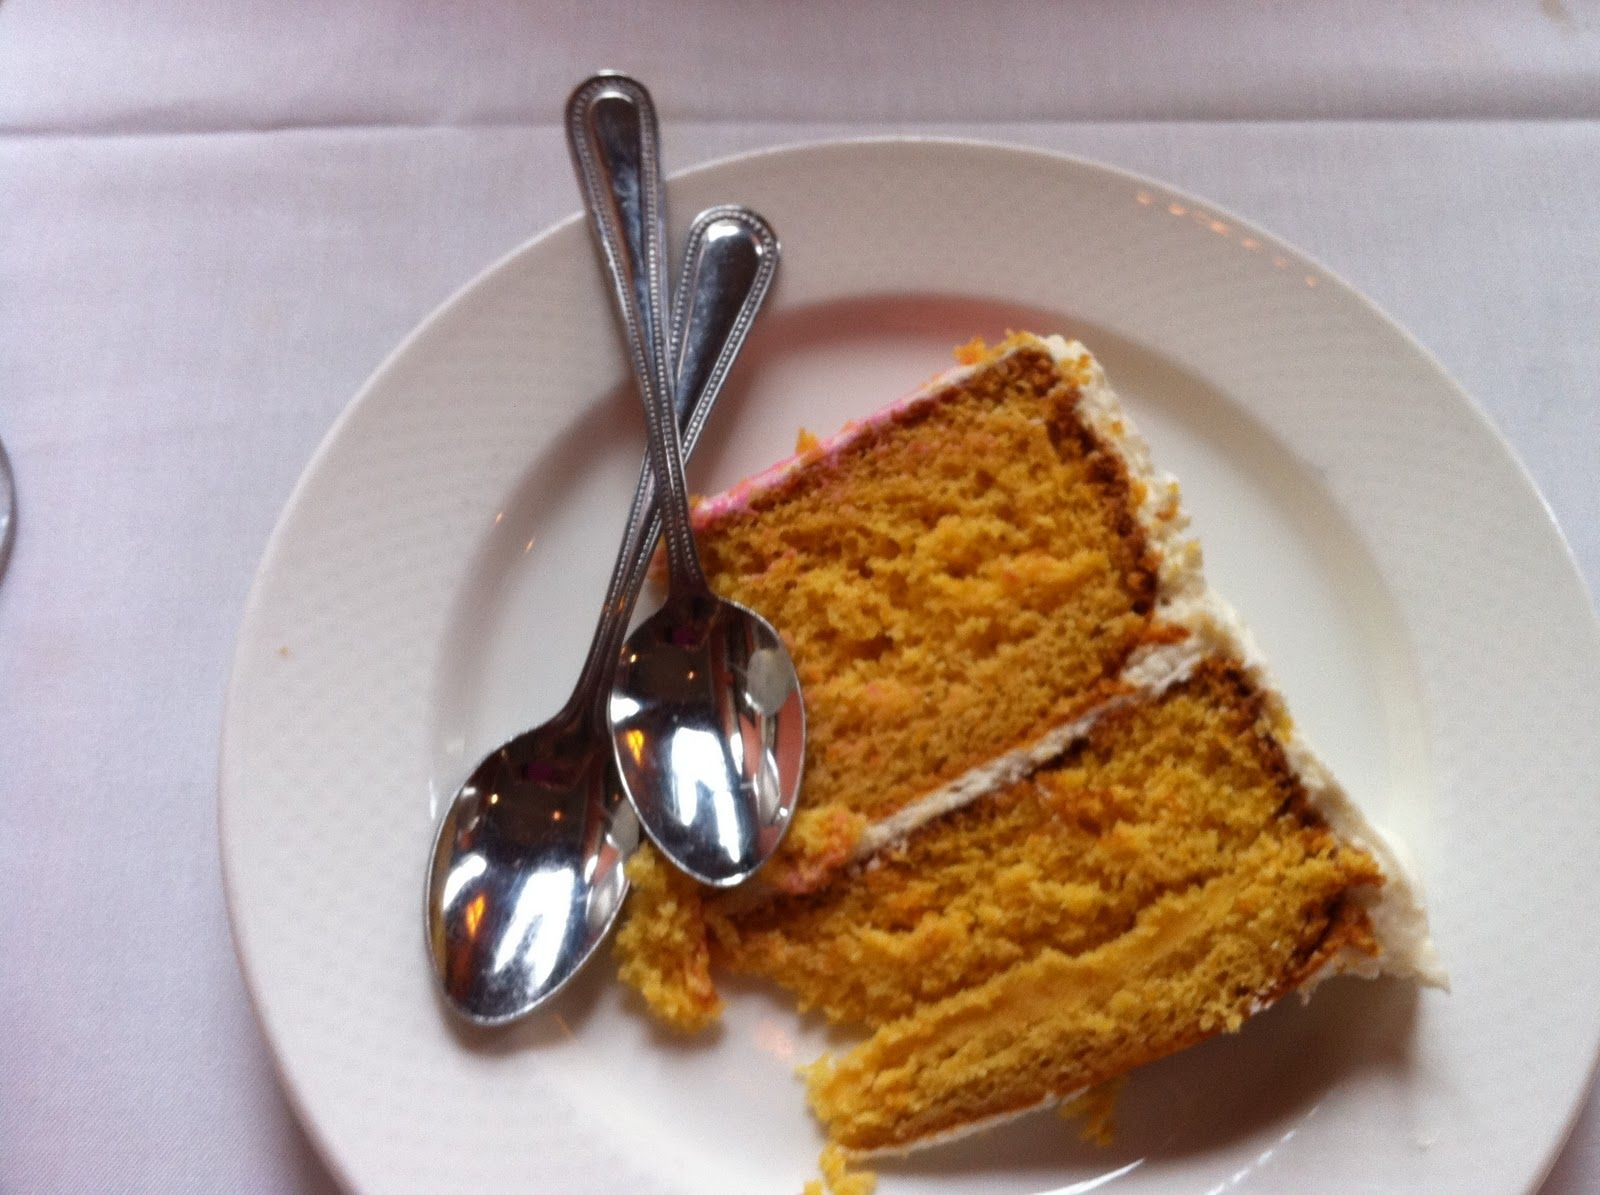 Brick Street Cafe (Greenville, SC) Sweet potato cake